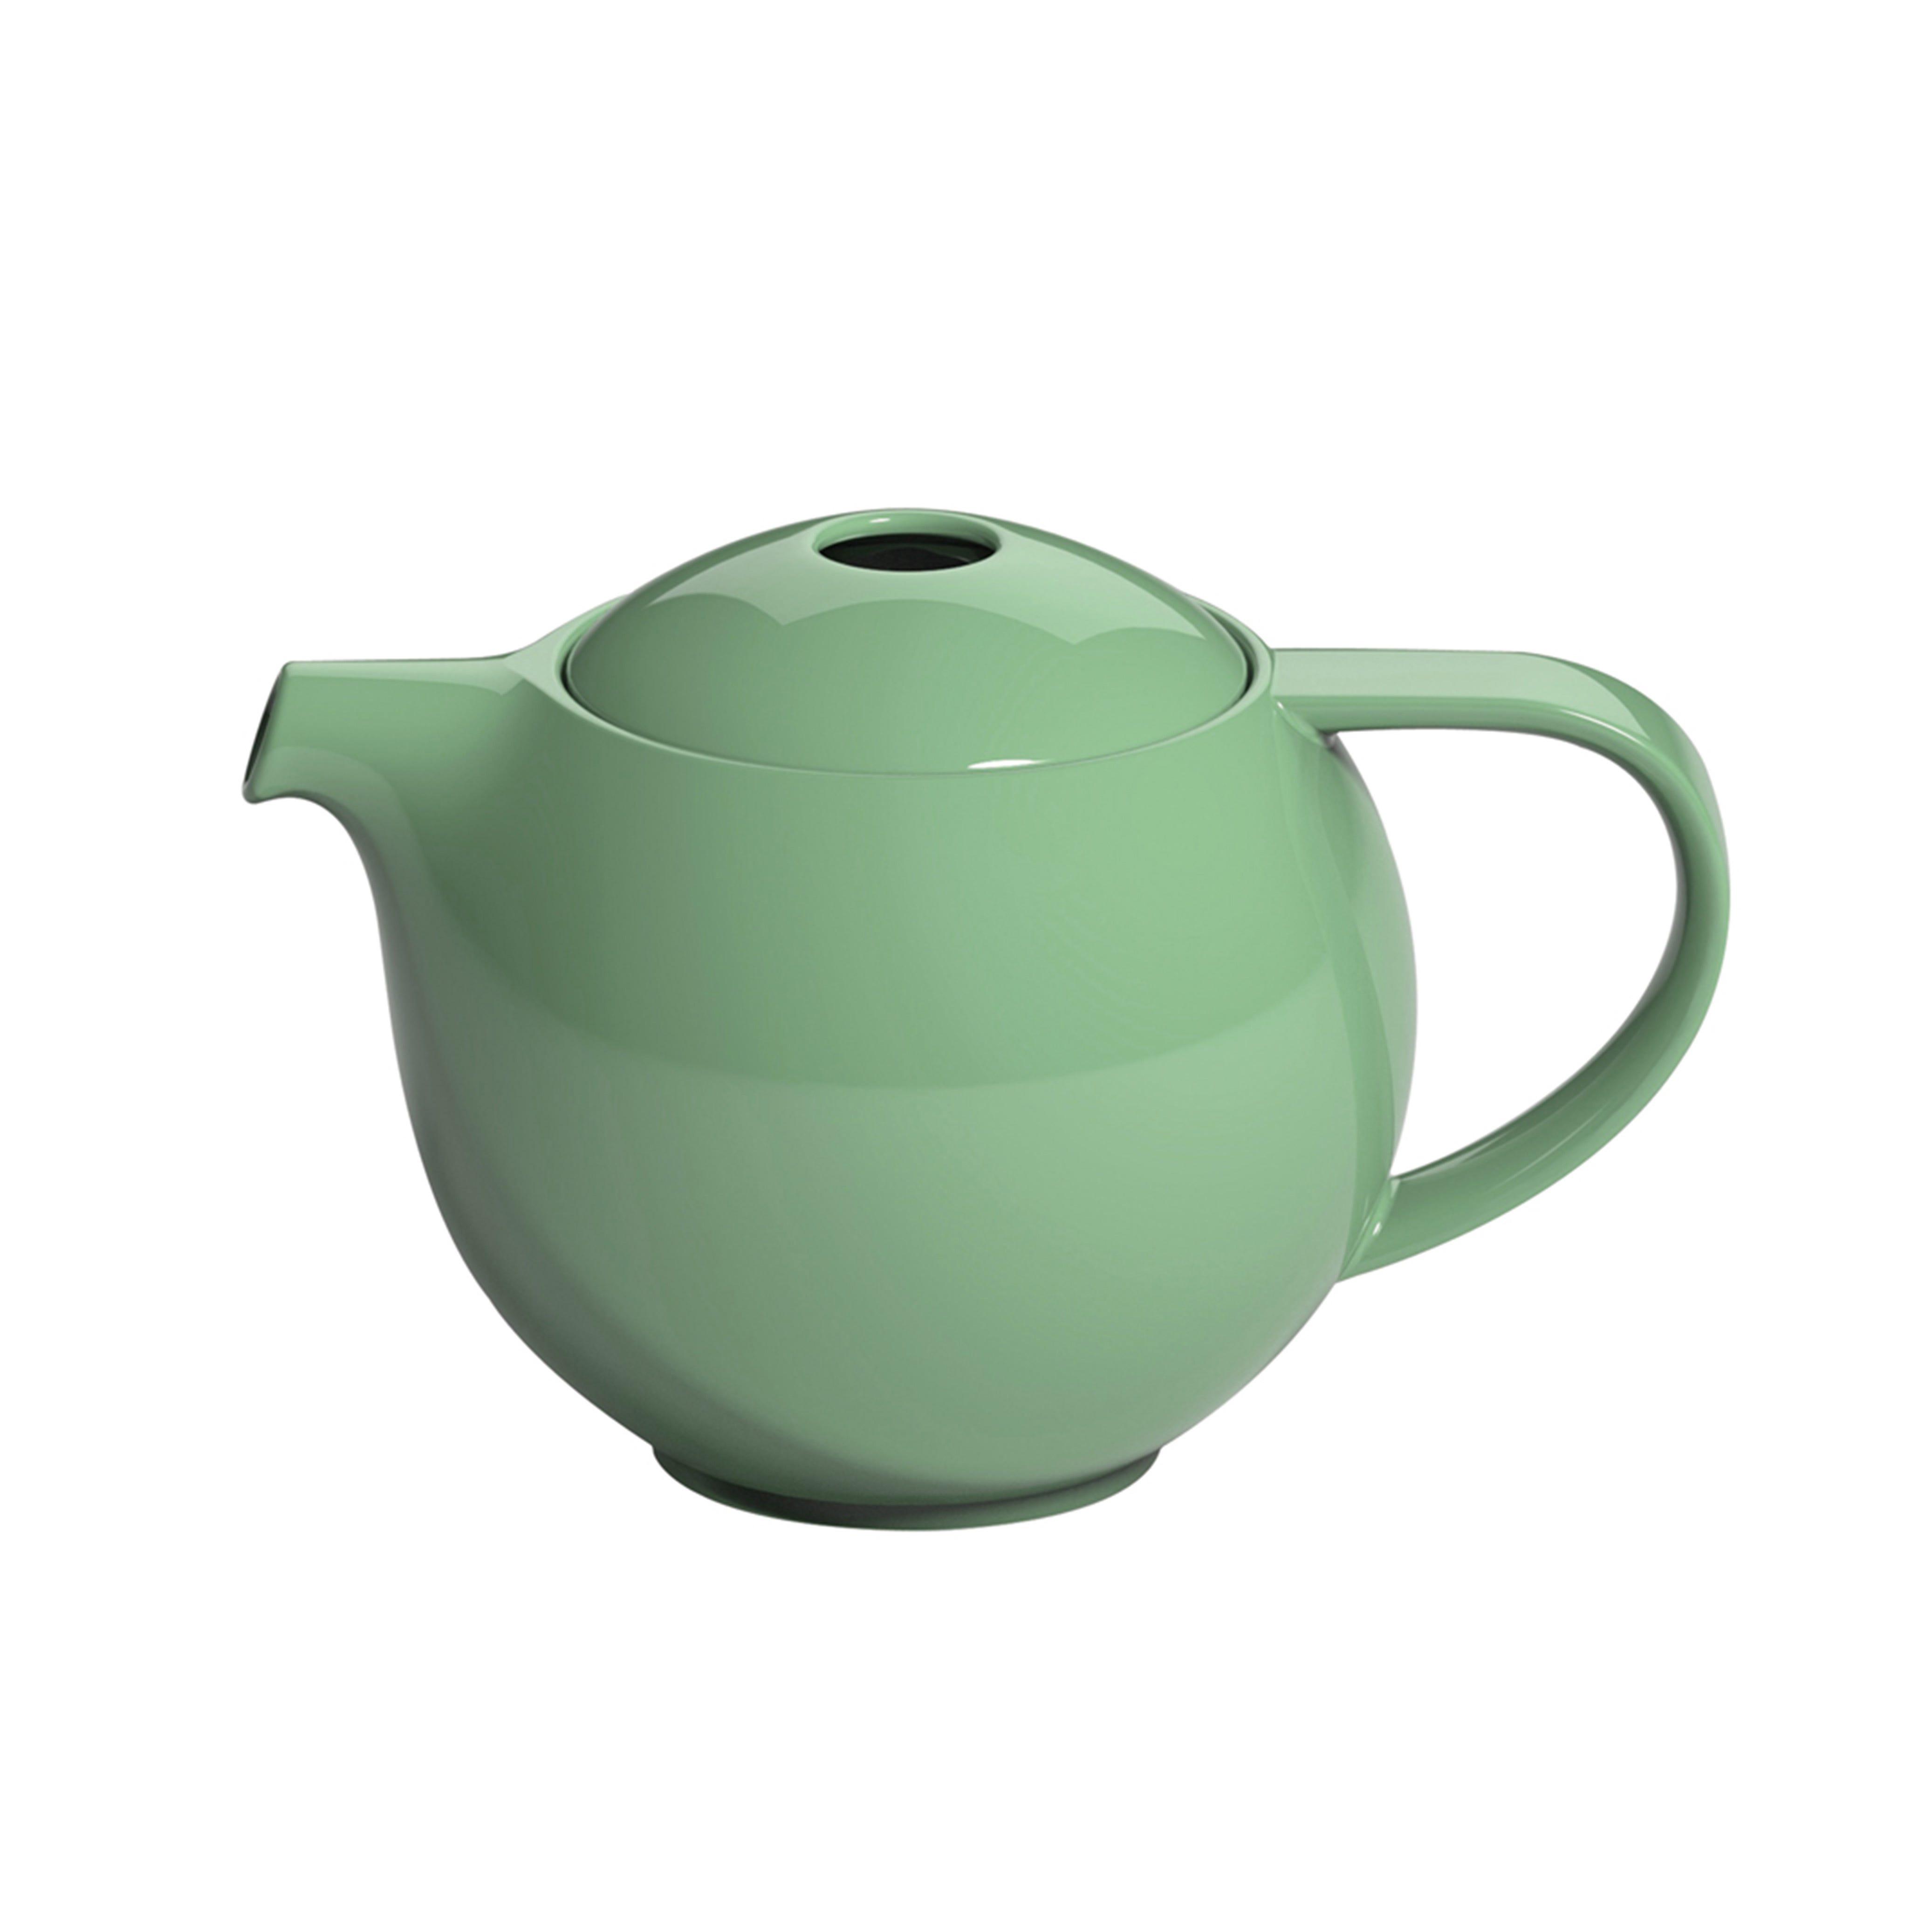 Pro Tea Teapot